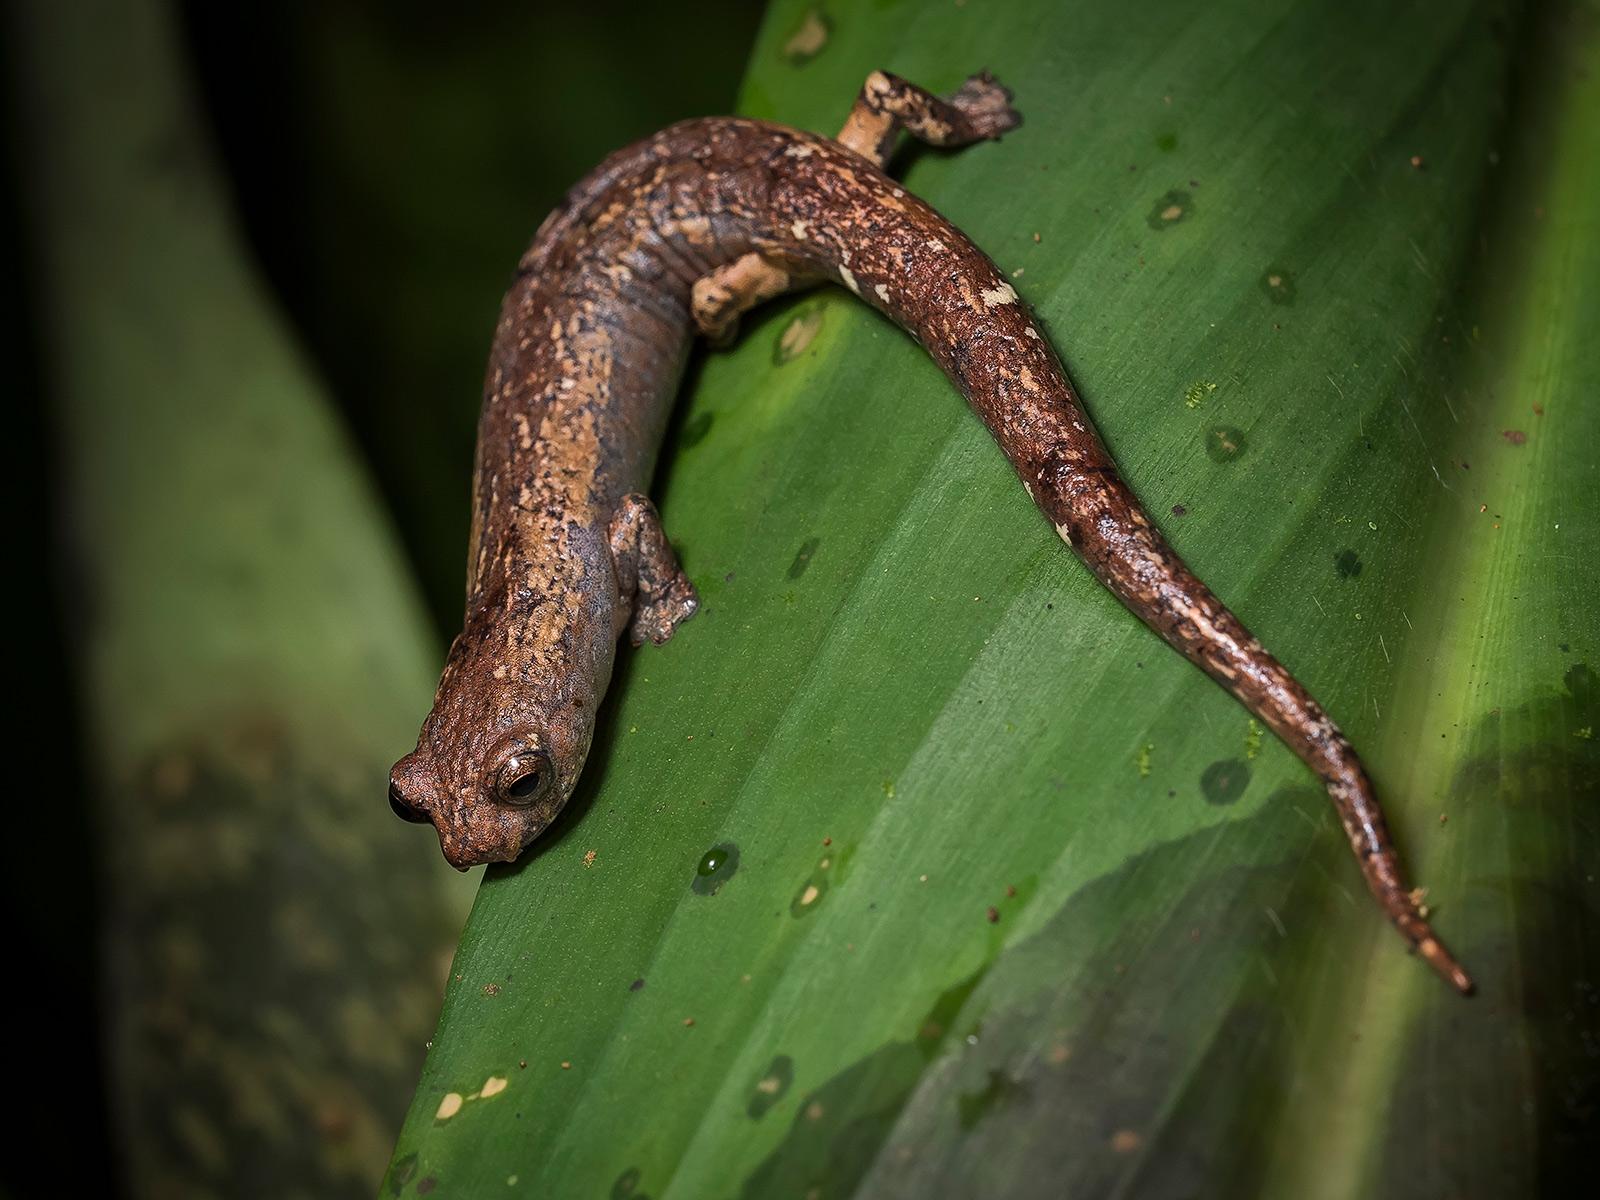 Bolitoglossa salamander, Sierra Nevada de Santa Marta, Colombia